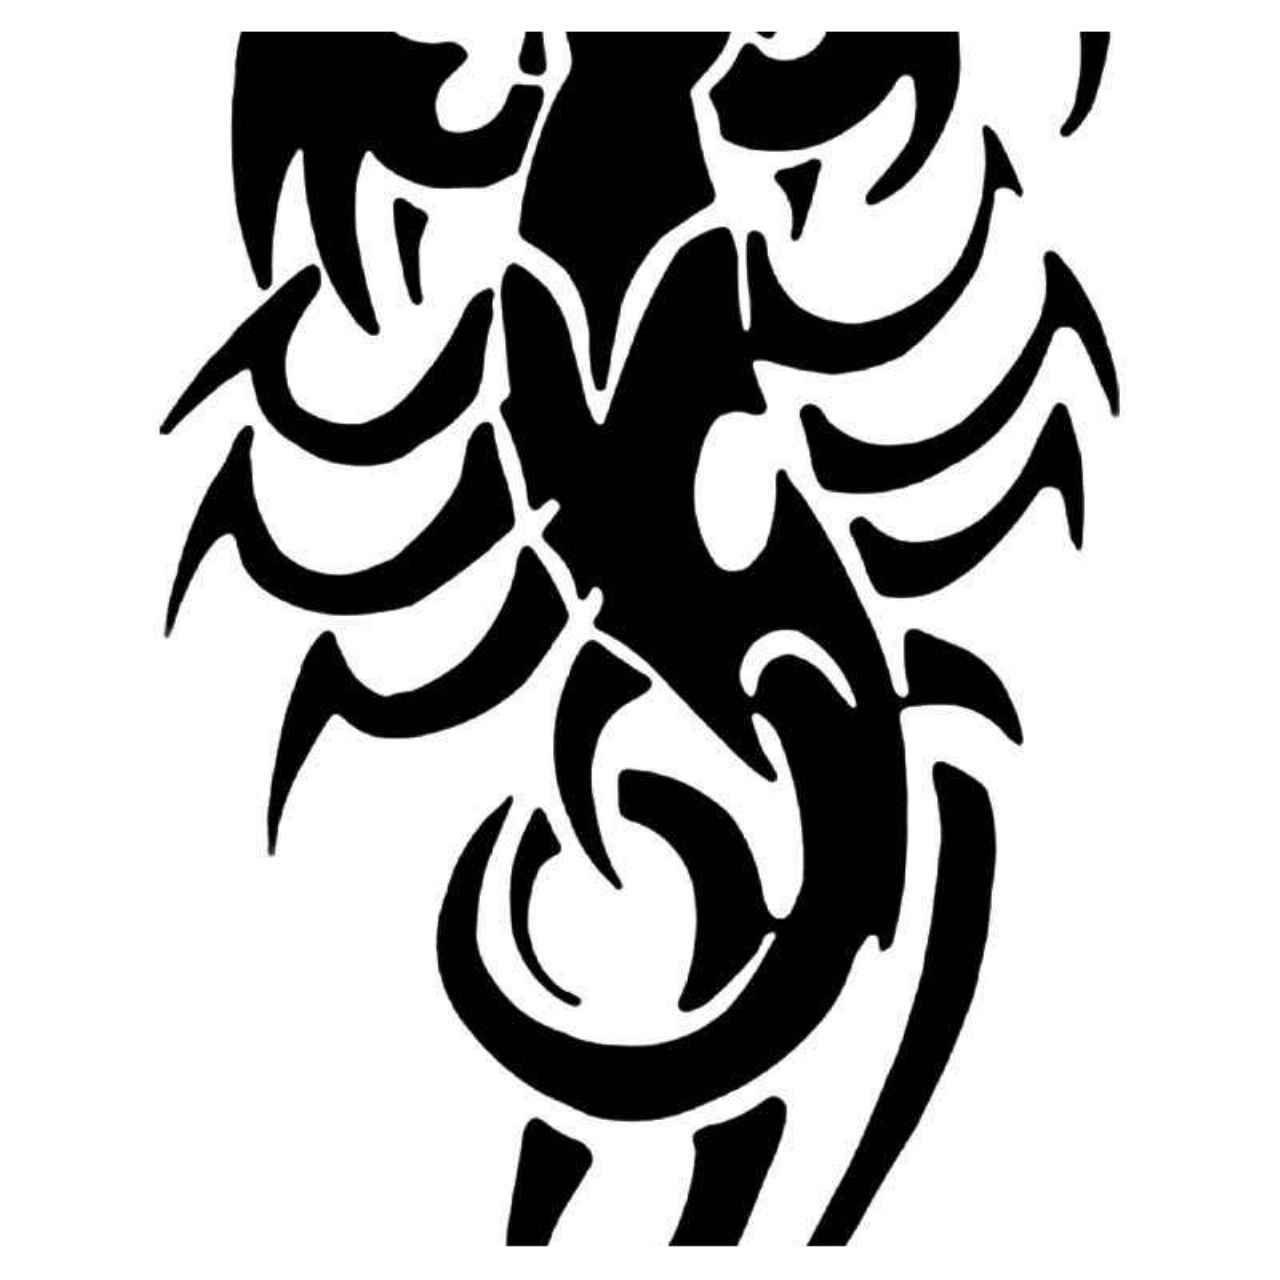 Tribal Scorpion Vinyl Sticker// Decal